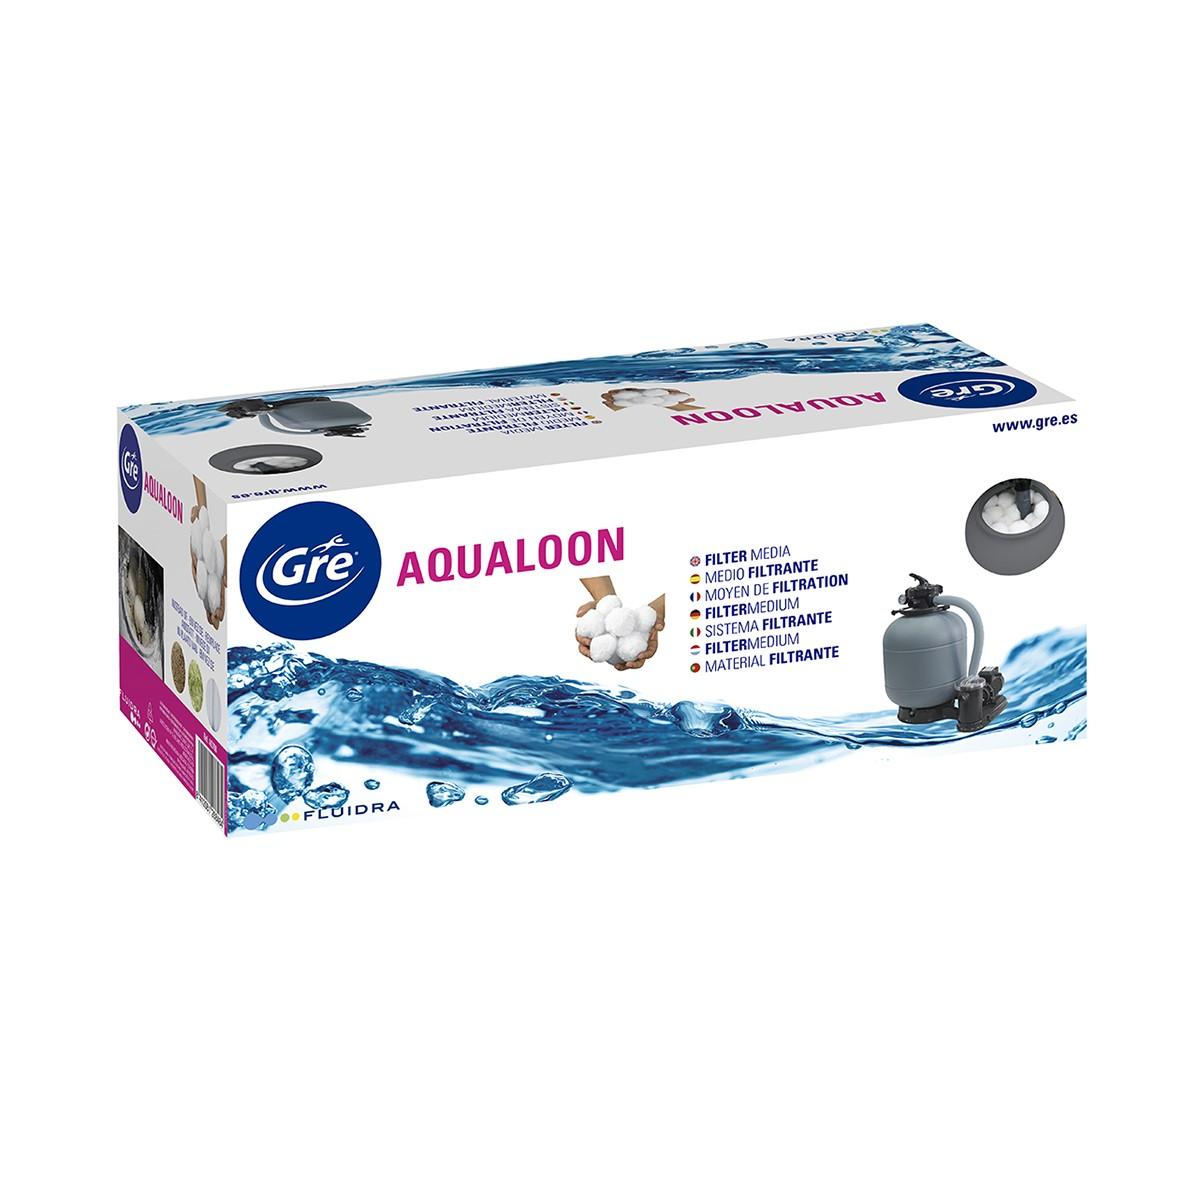 Aqualoon Filtri